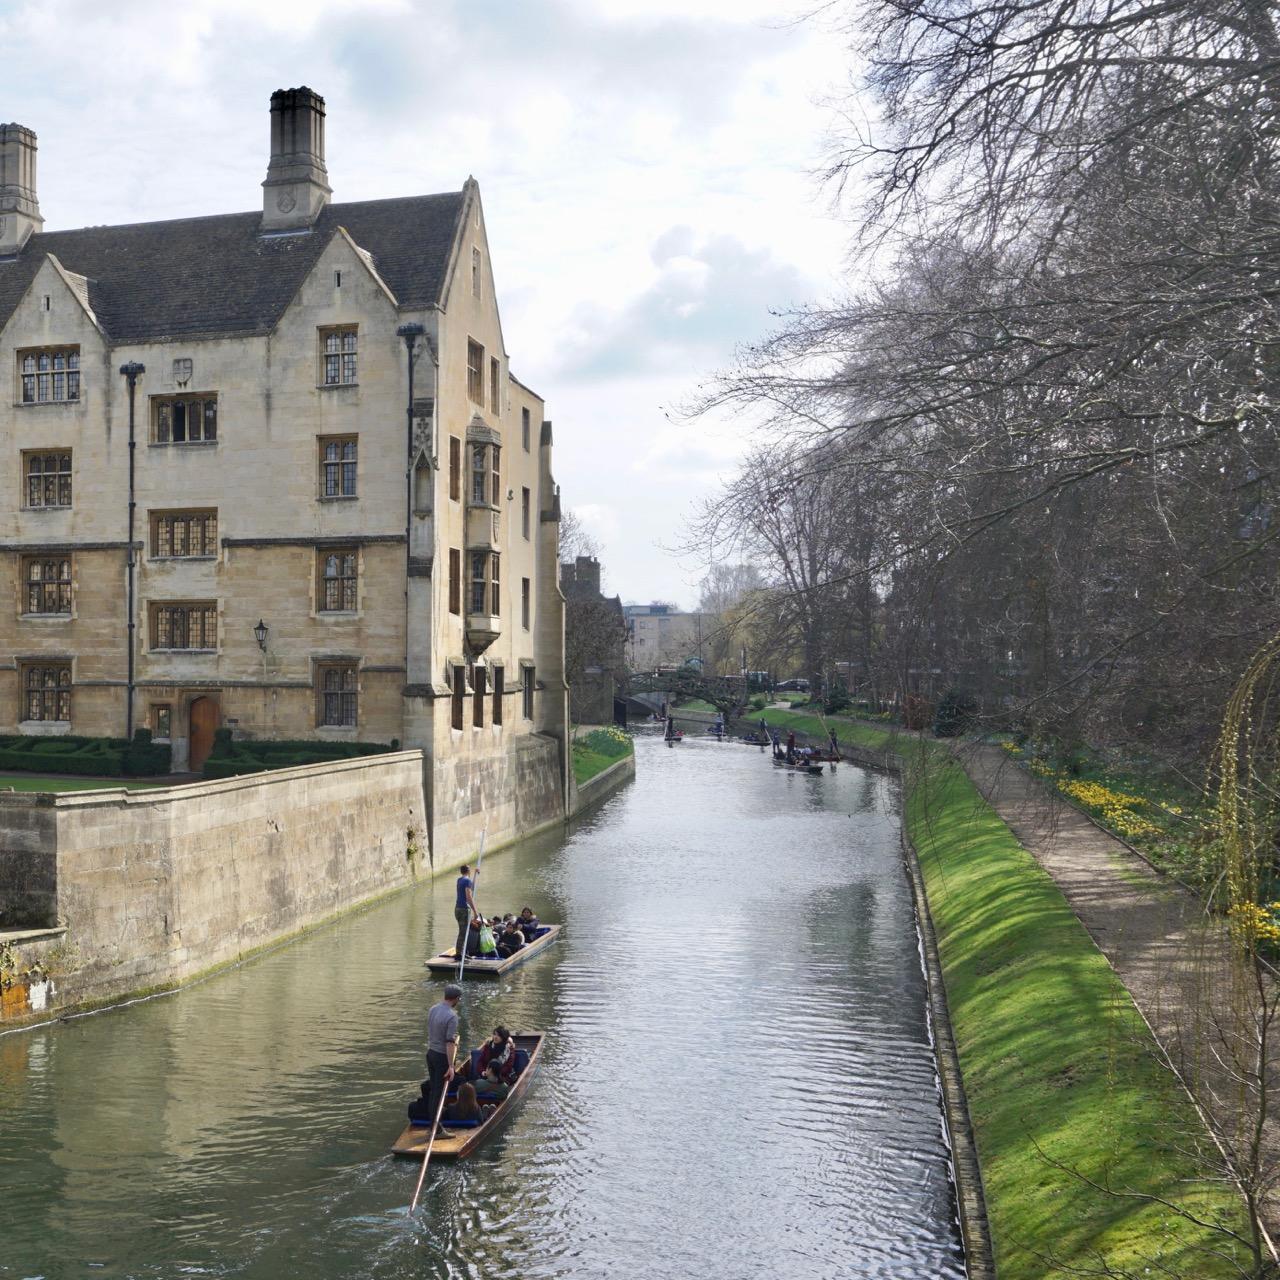 Punting, Cambridge, England